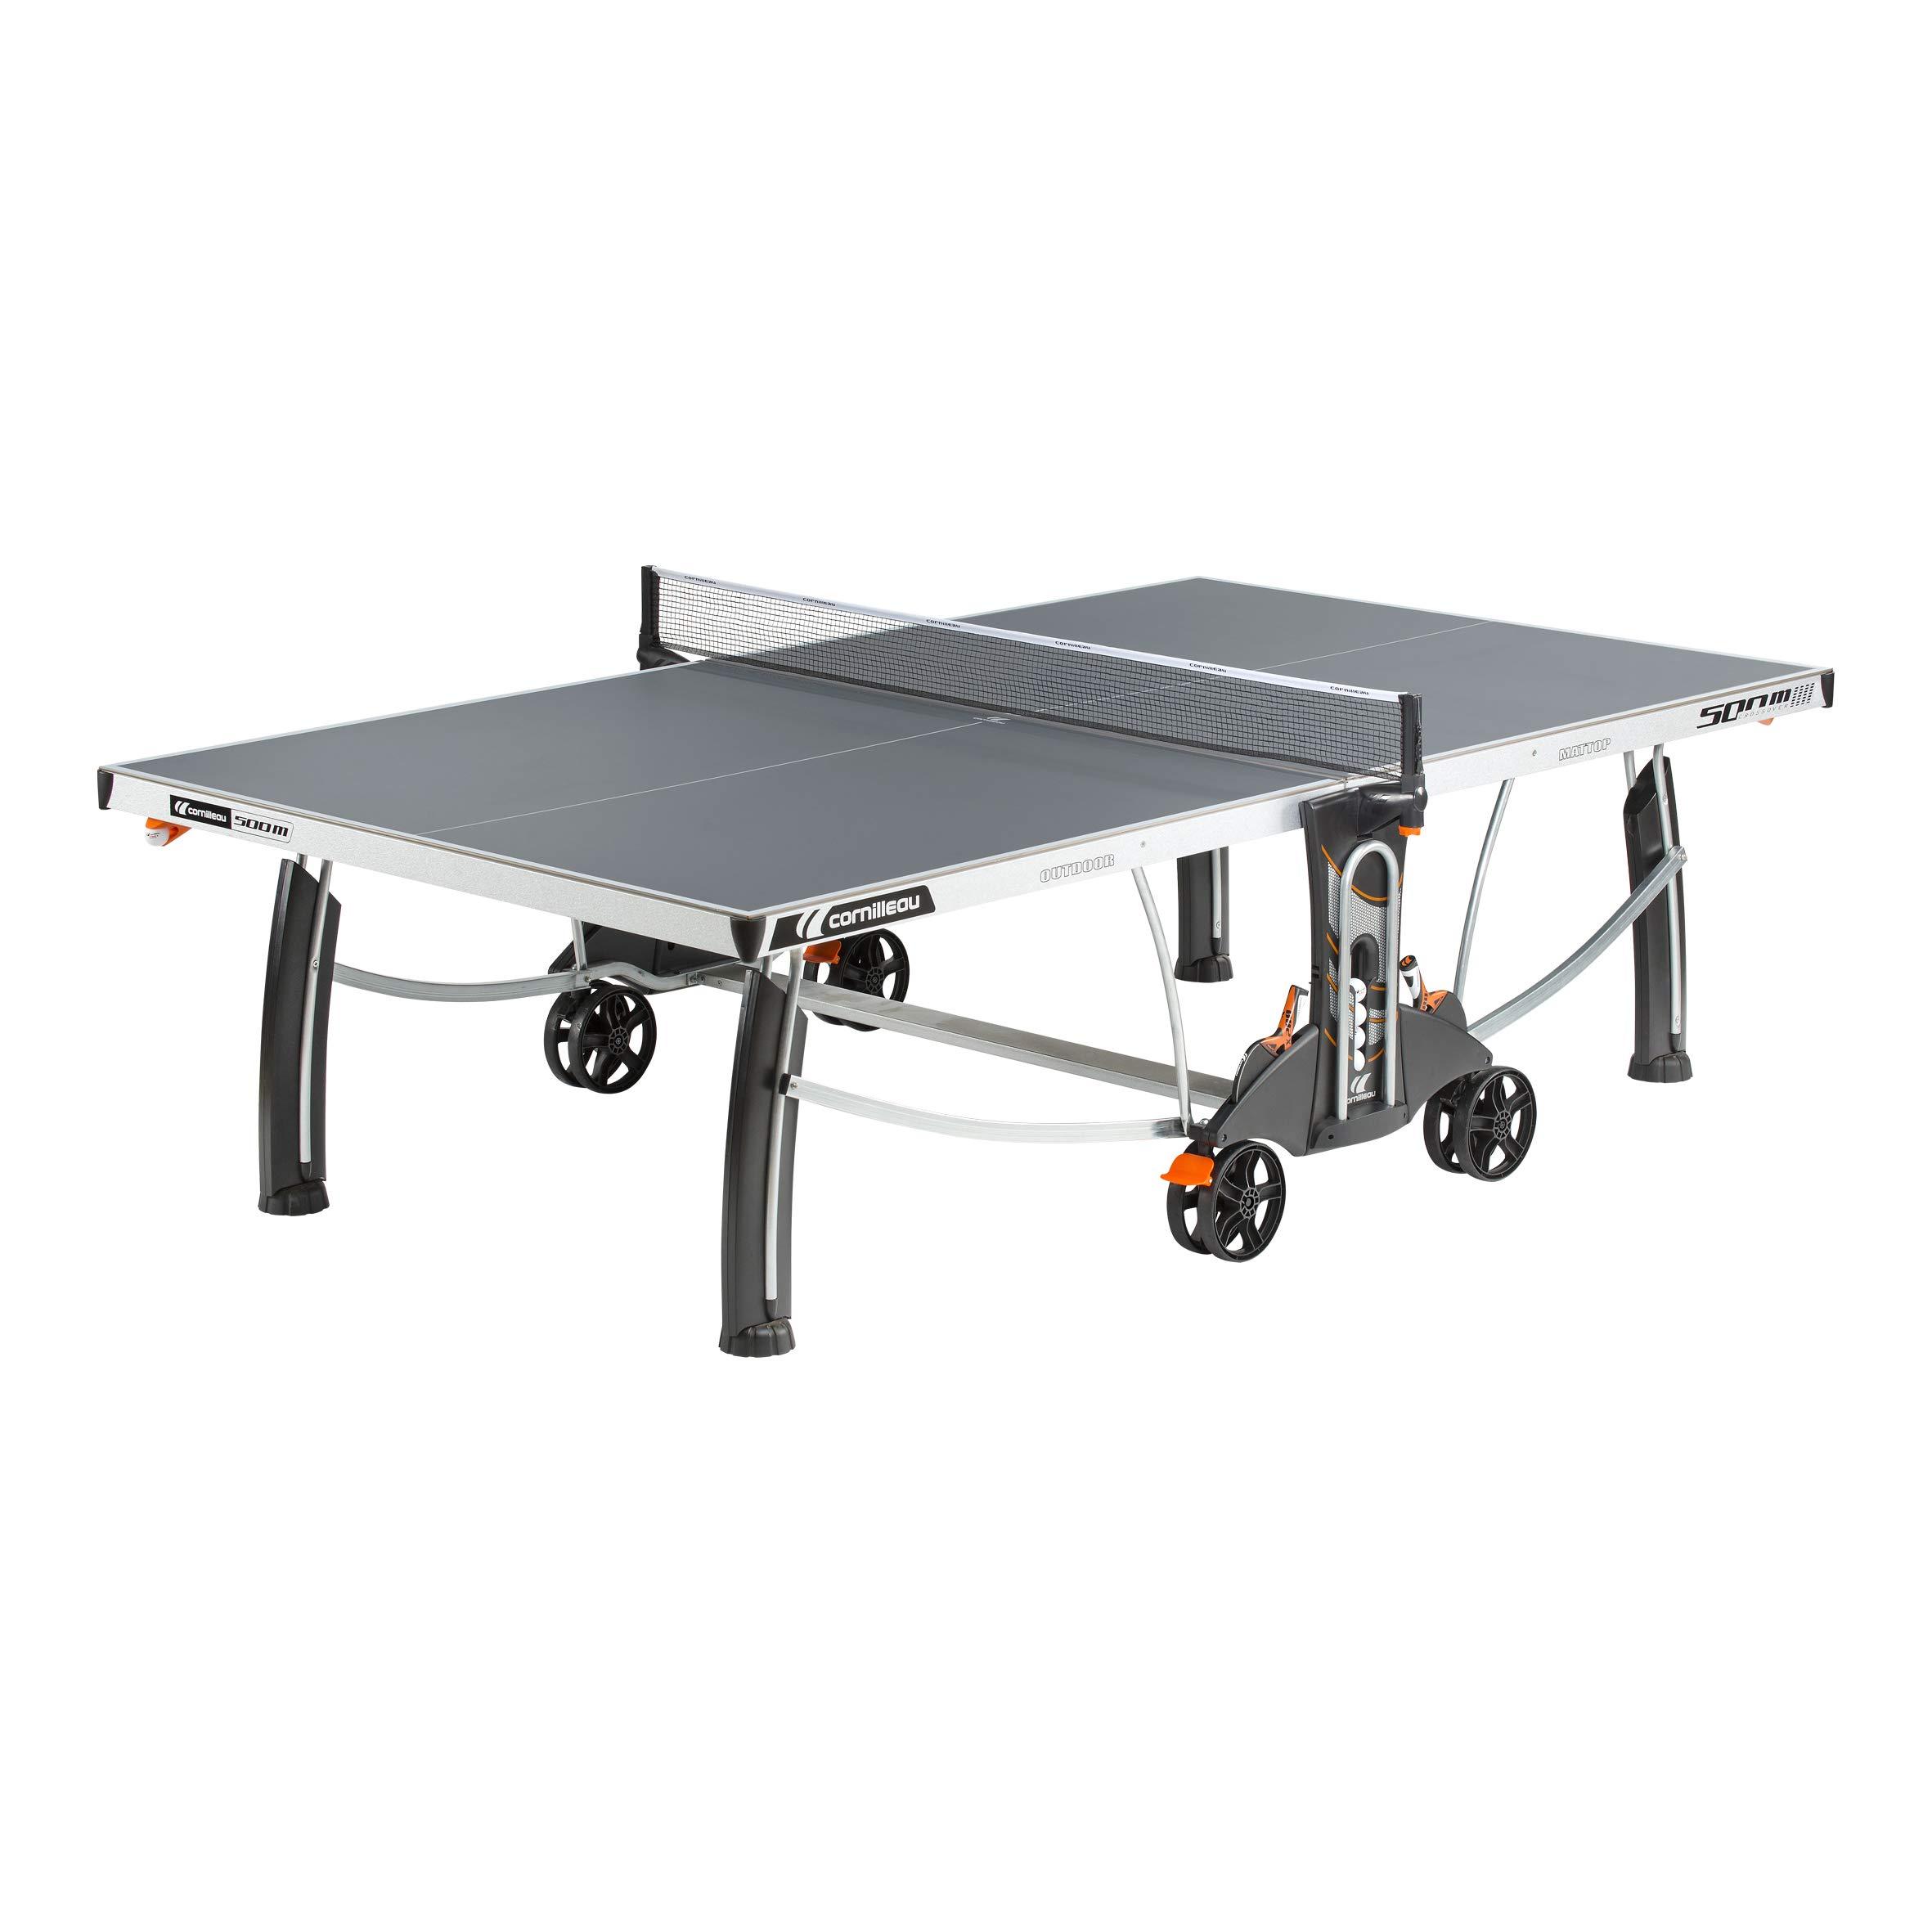 Cornilleau 500M Crossover Indoor/Outdoor Gray Table Tennis Table